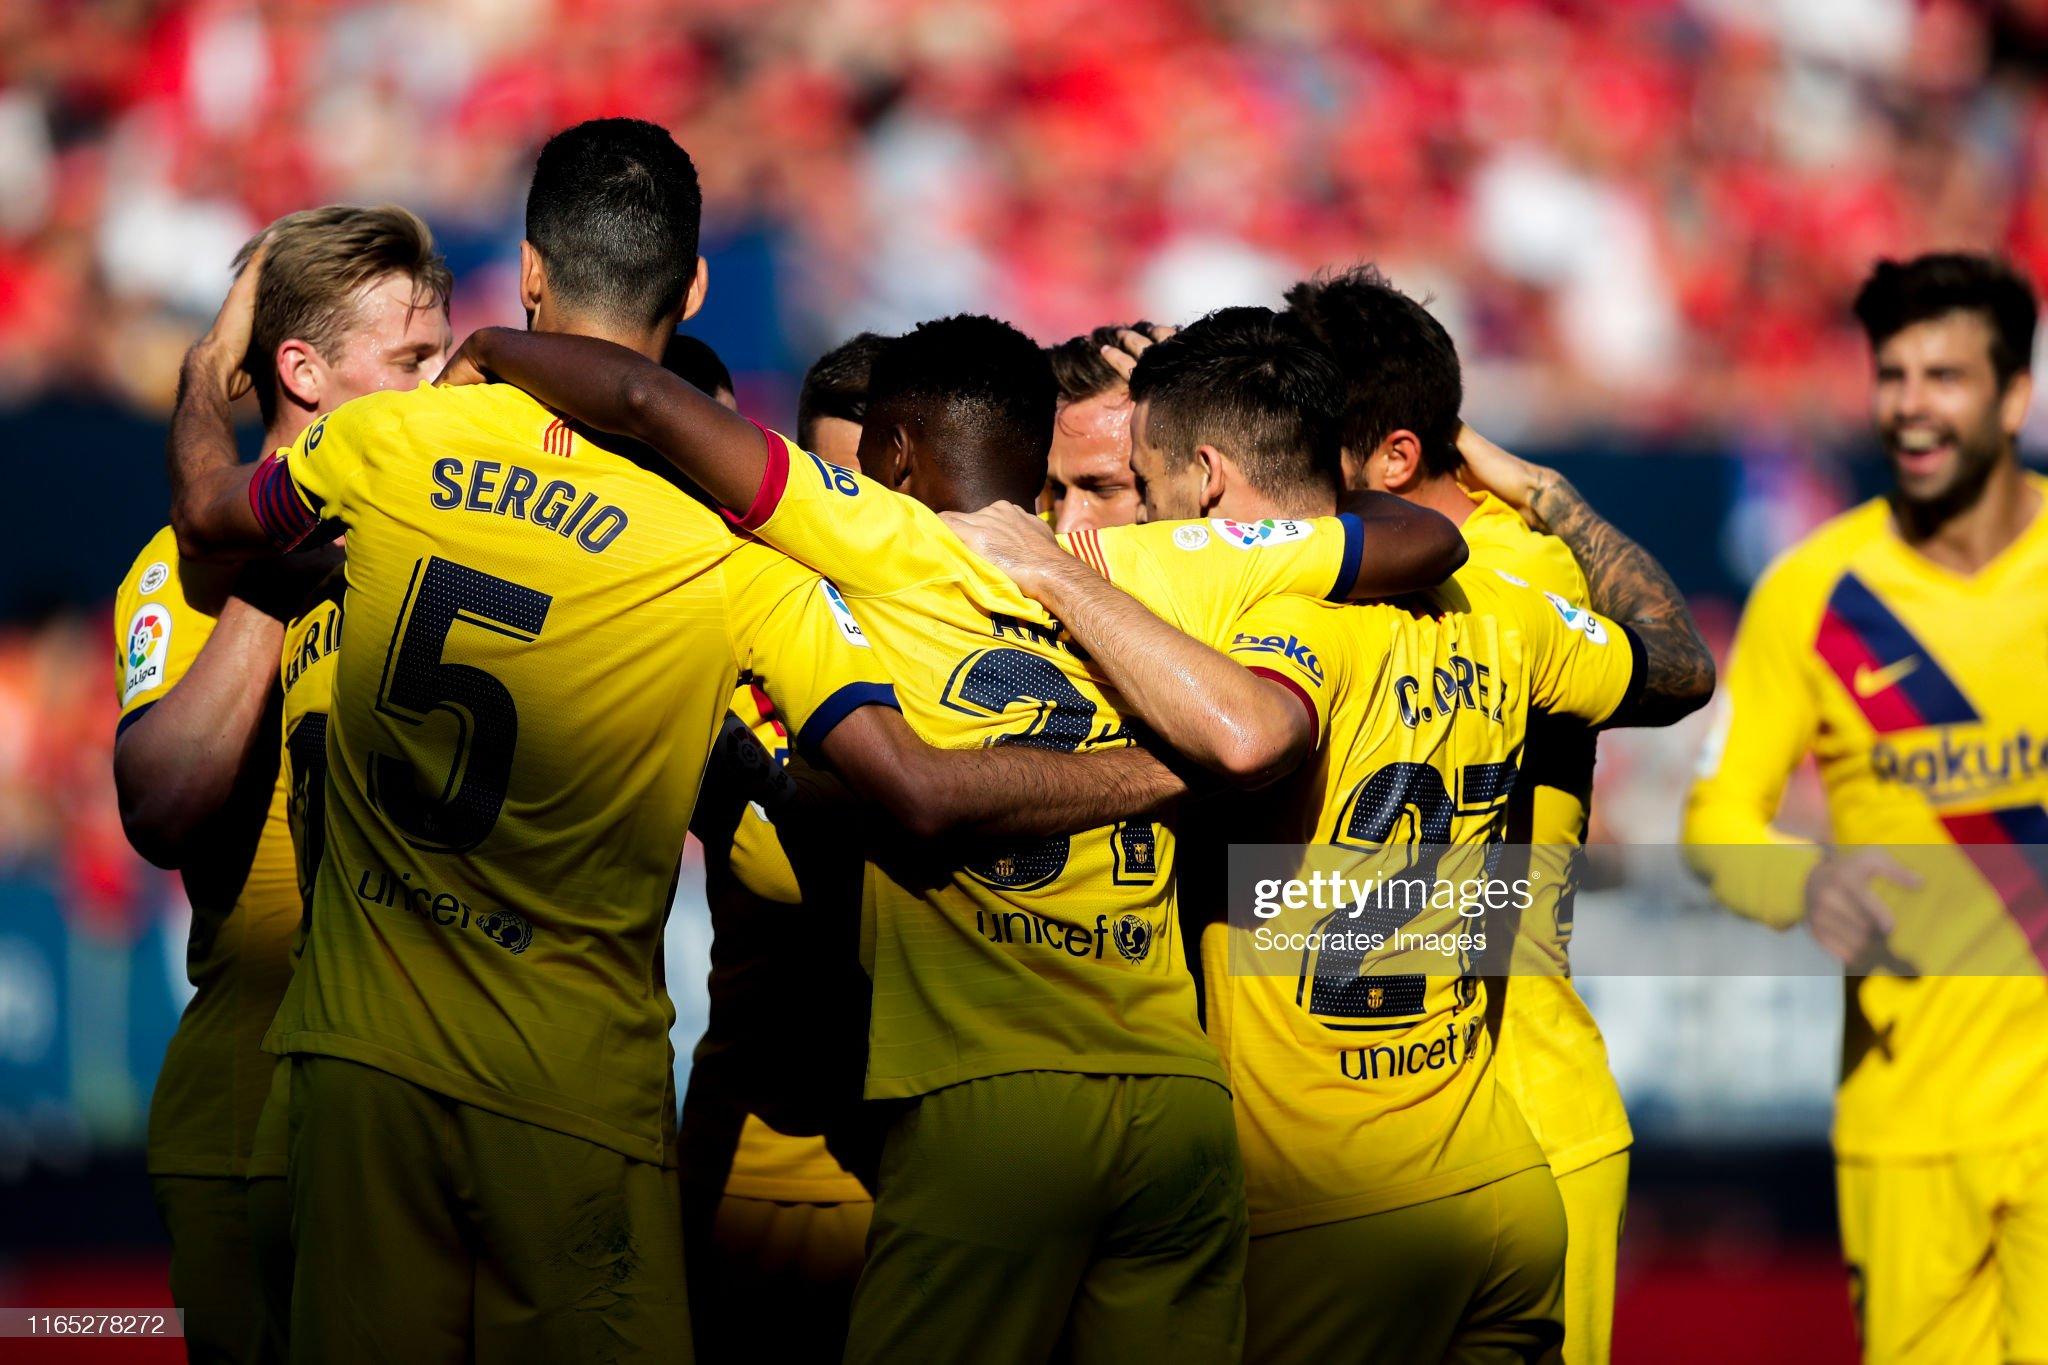 صور مباراة : أوساسونا - برشلونة 2-2 ( 31-08-2019 )  Ansu-fati-of-fc-barcelona-sergio-busquets-of-fc-barcelona-jordi-alba-picture-id1165278272?s=2048x2048